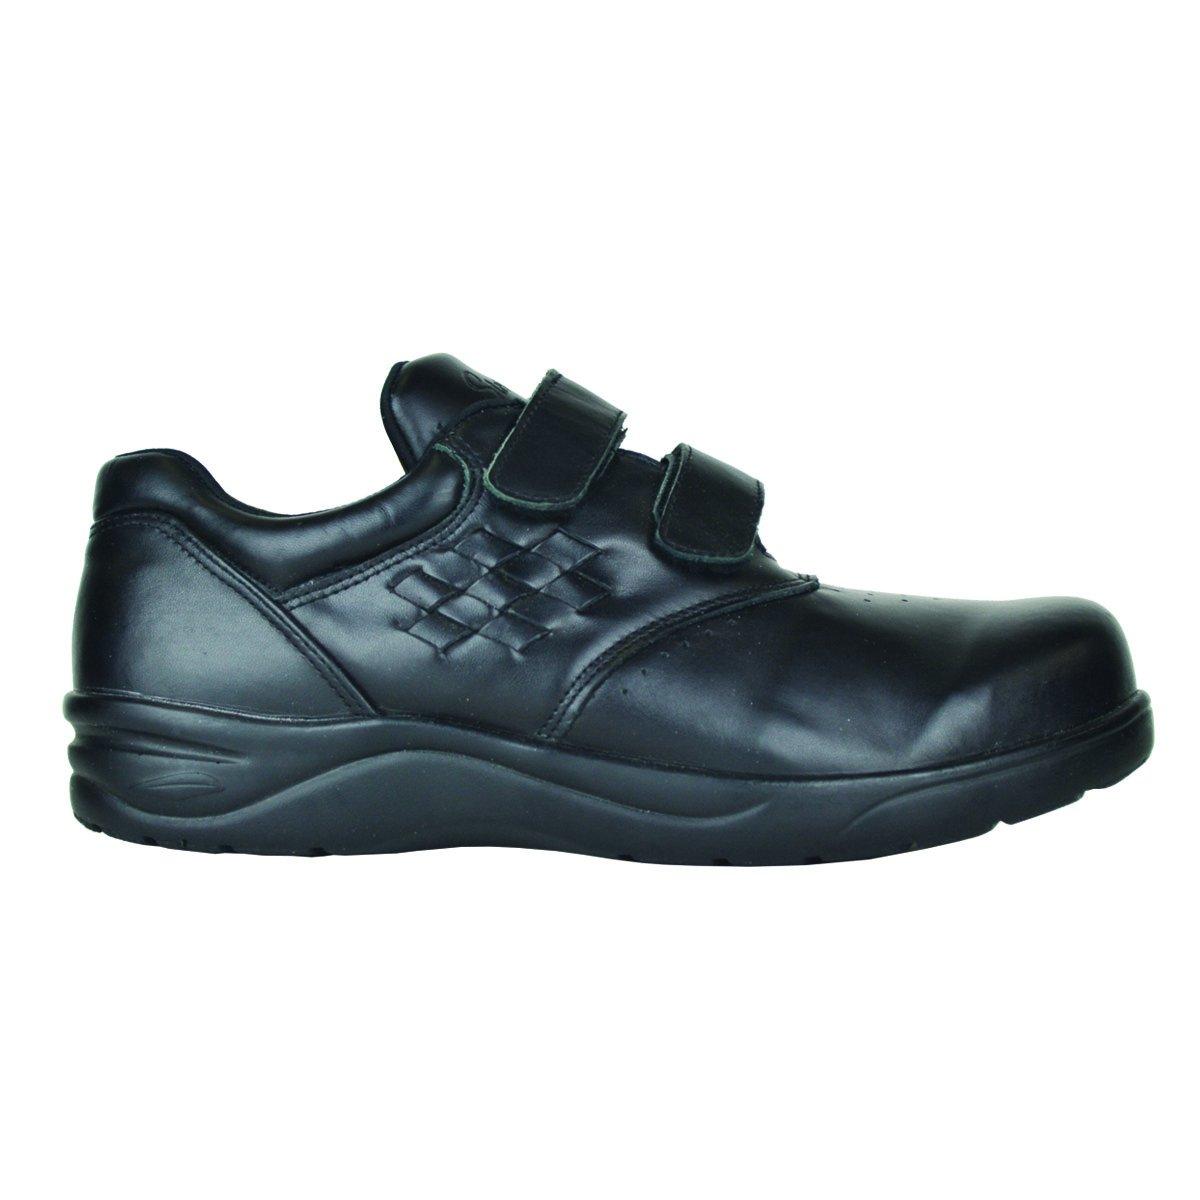 Stride Lite Women's Dublin Therapeutic Extra Depth Shoe Double Velcro Strap B01N963Q8W 15 B(M) US|Black